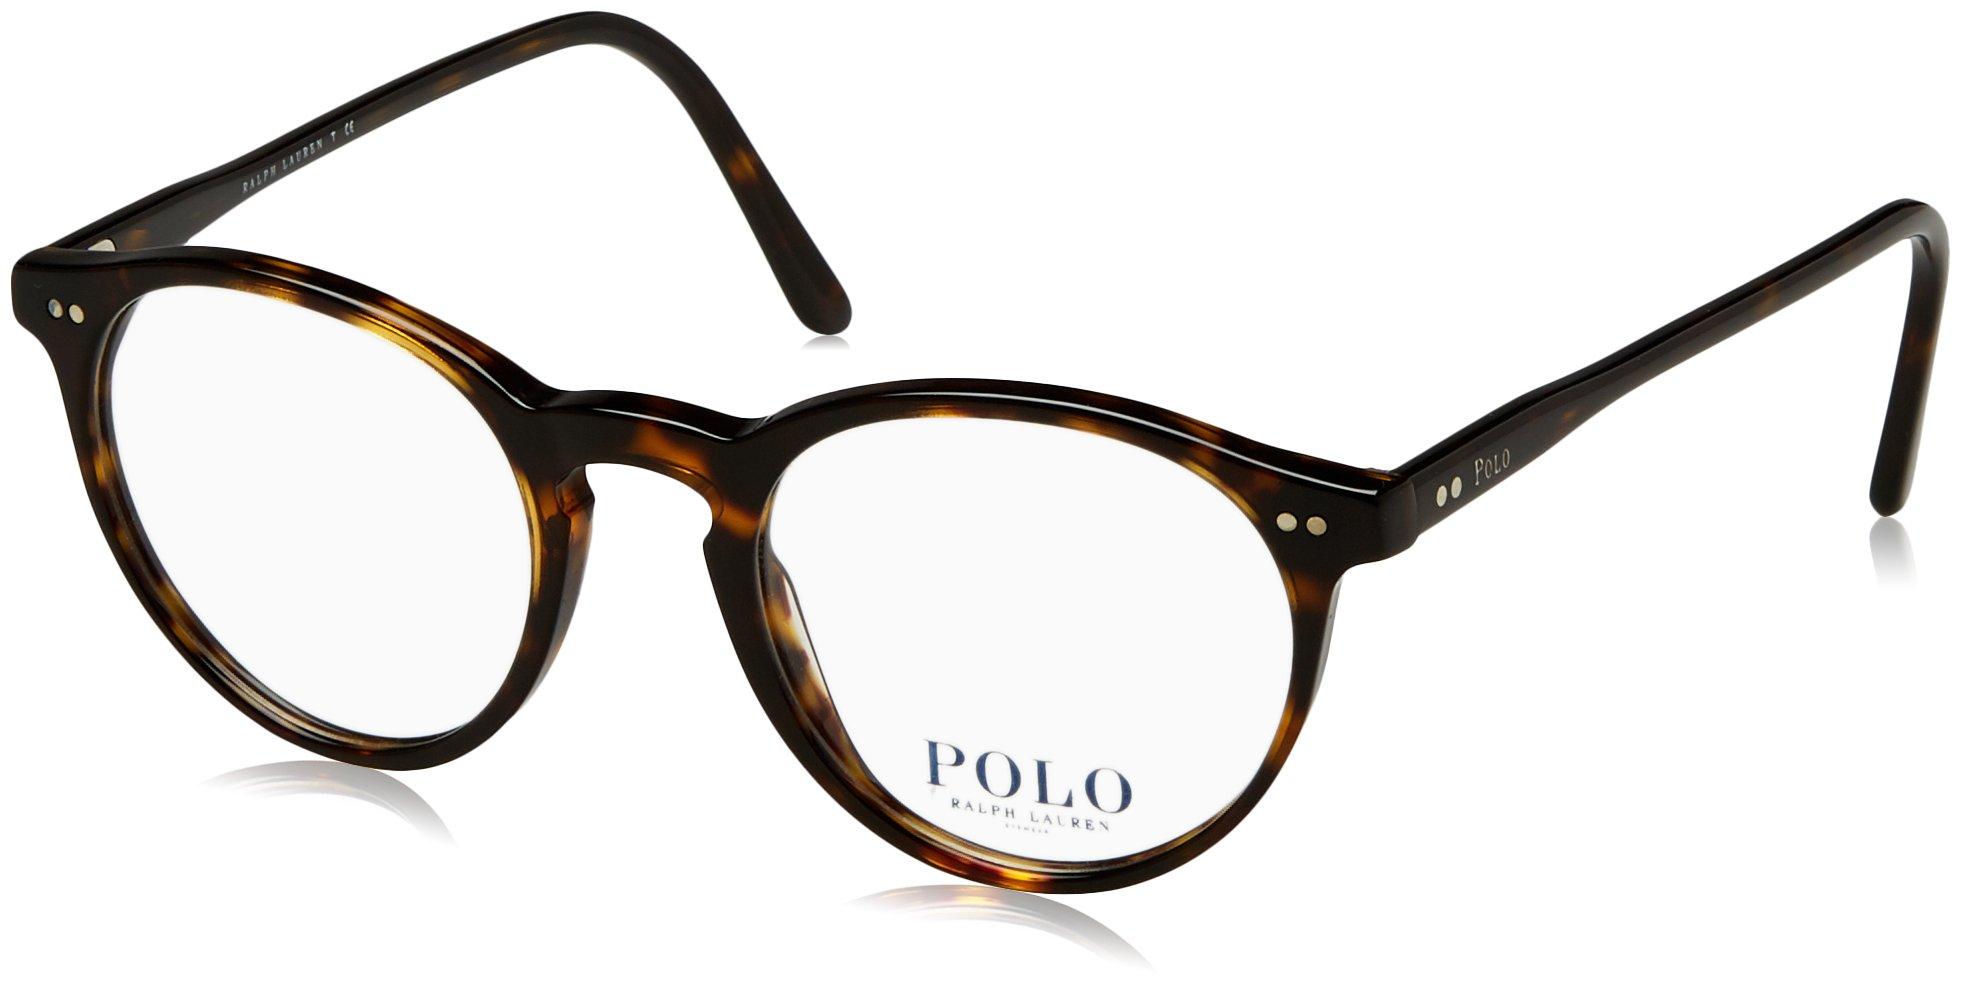 Polo PH2083 Eyeglass Frames 5003-48 - Shiny Dark Havana PH2083-5003-48